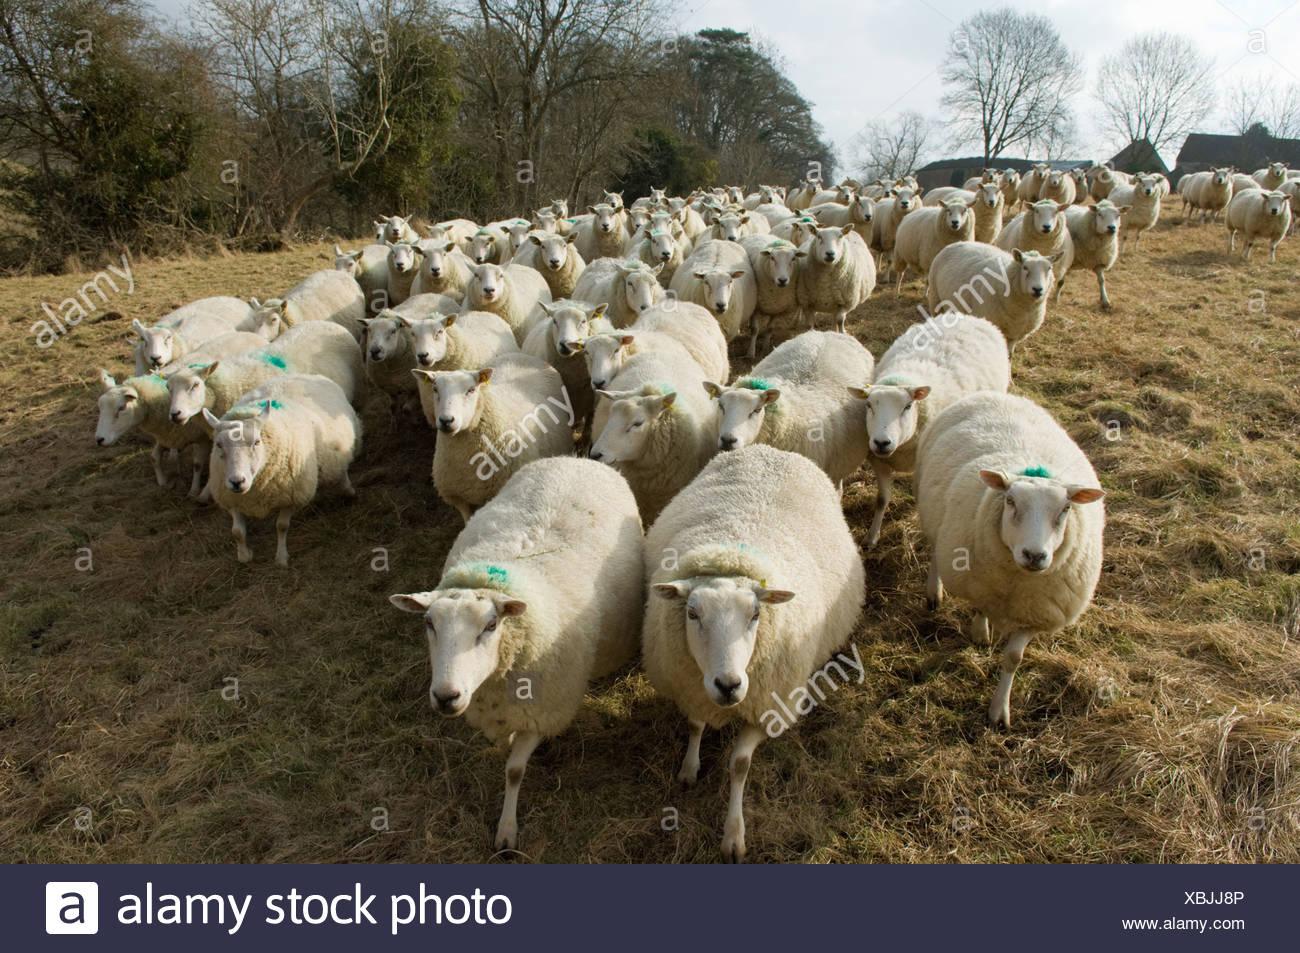 Flock of sheep - Stock Image